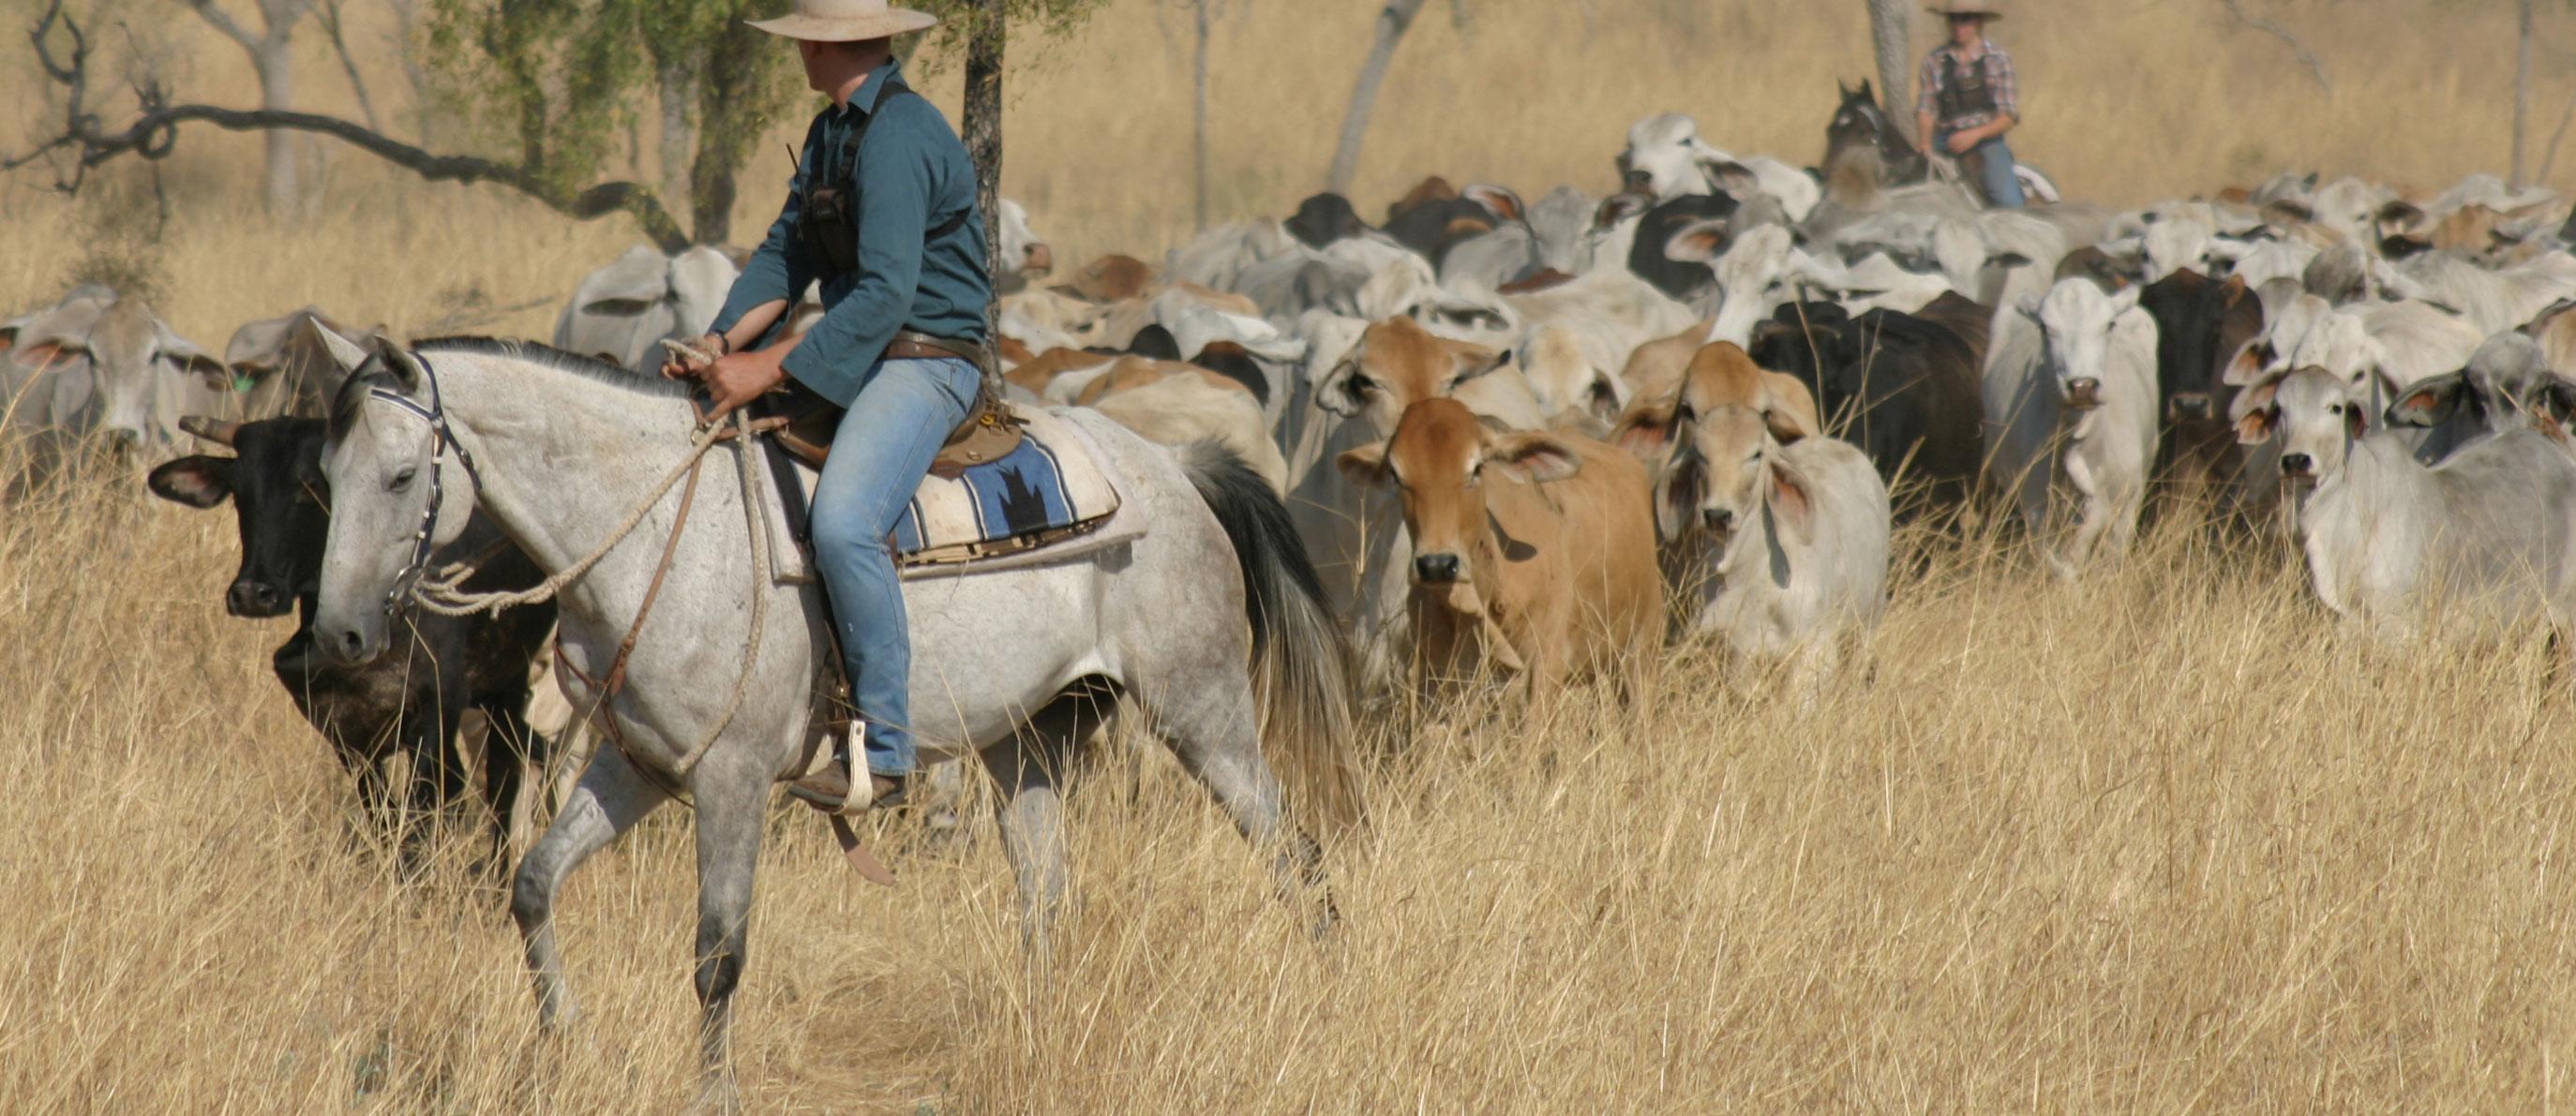 Developing northern australia csiro malvernweather Image collections